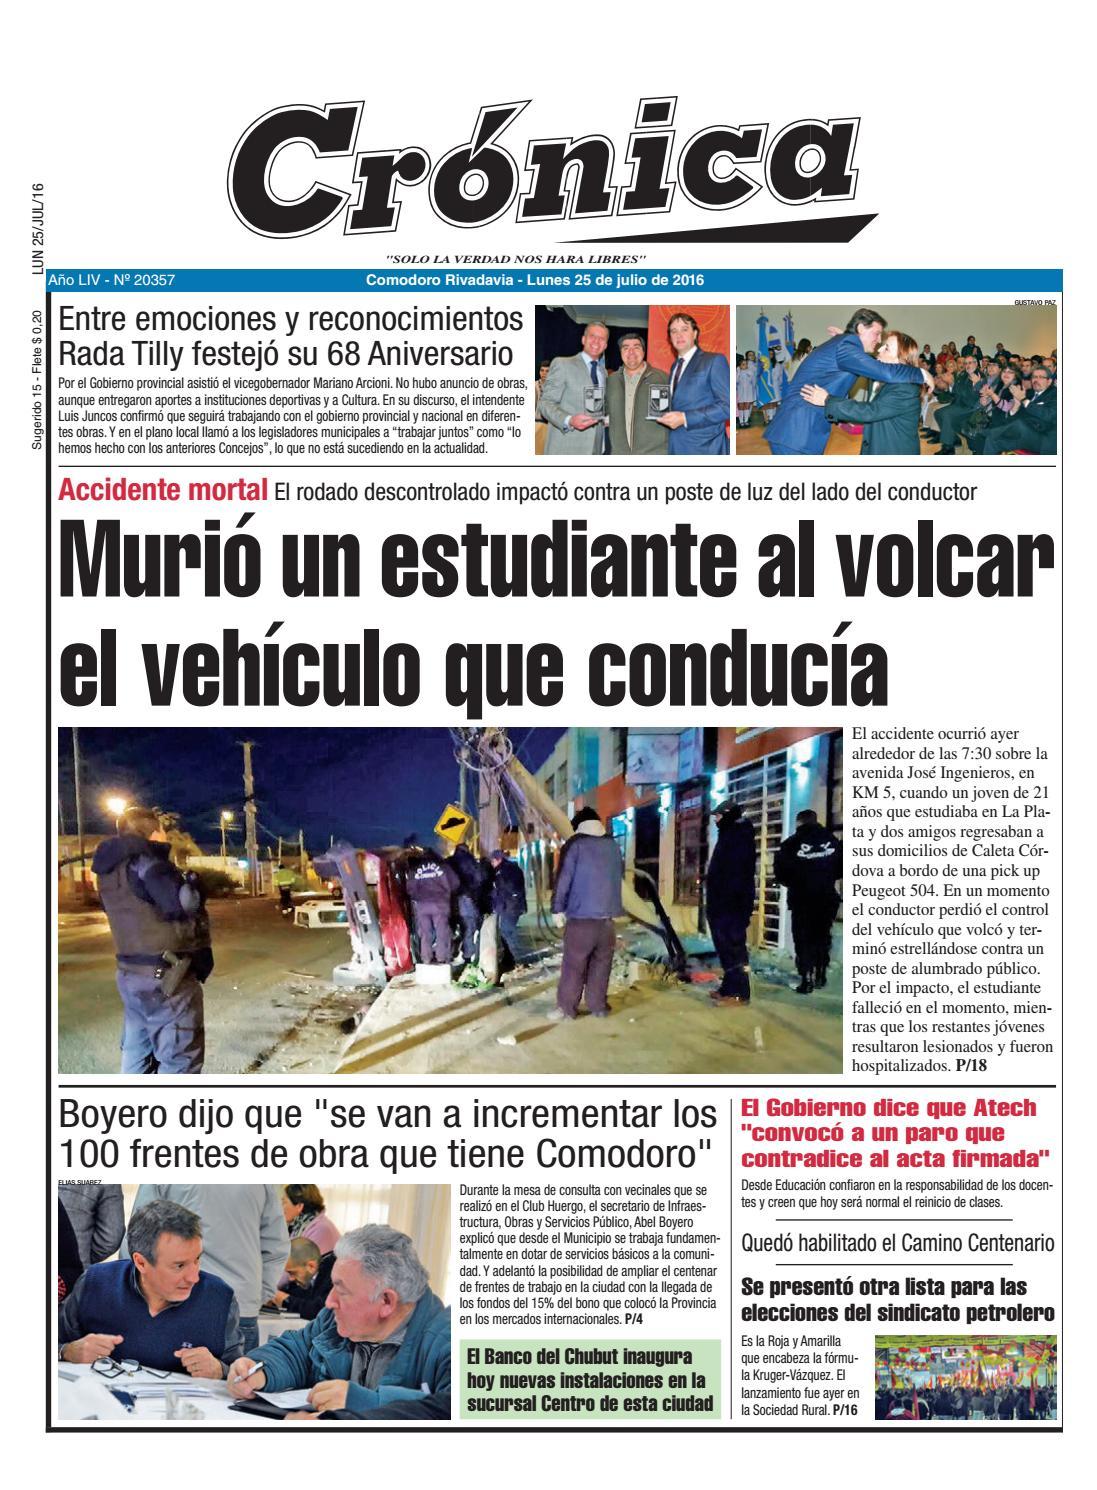 03e2c2804af67bcf1e9cfd1604a31daf by Diario Crónica - issuu